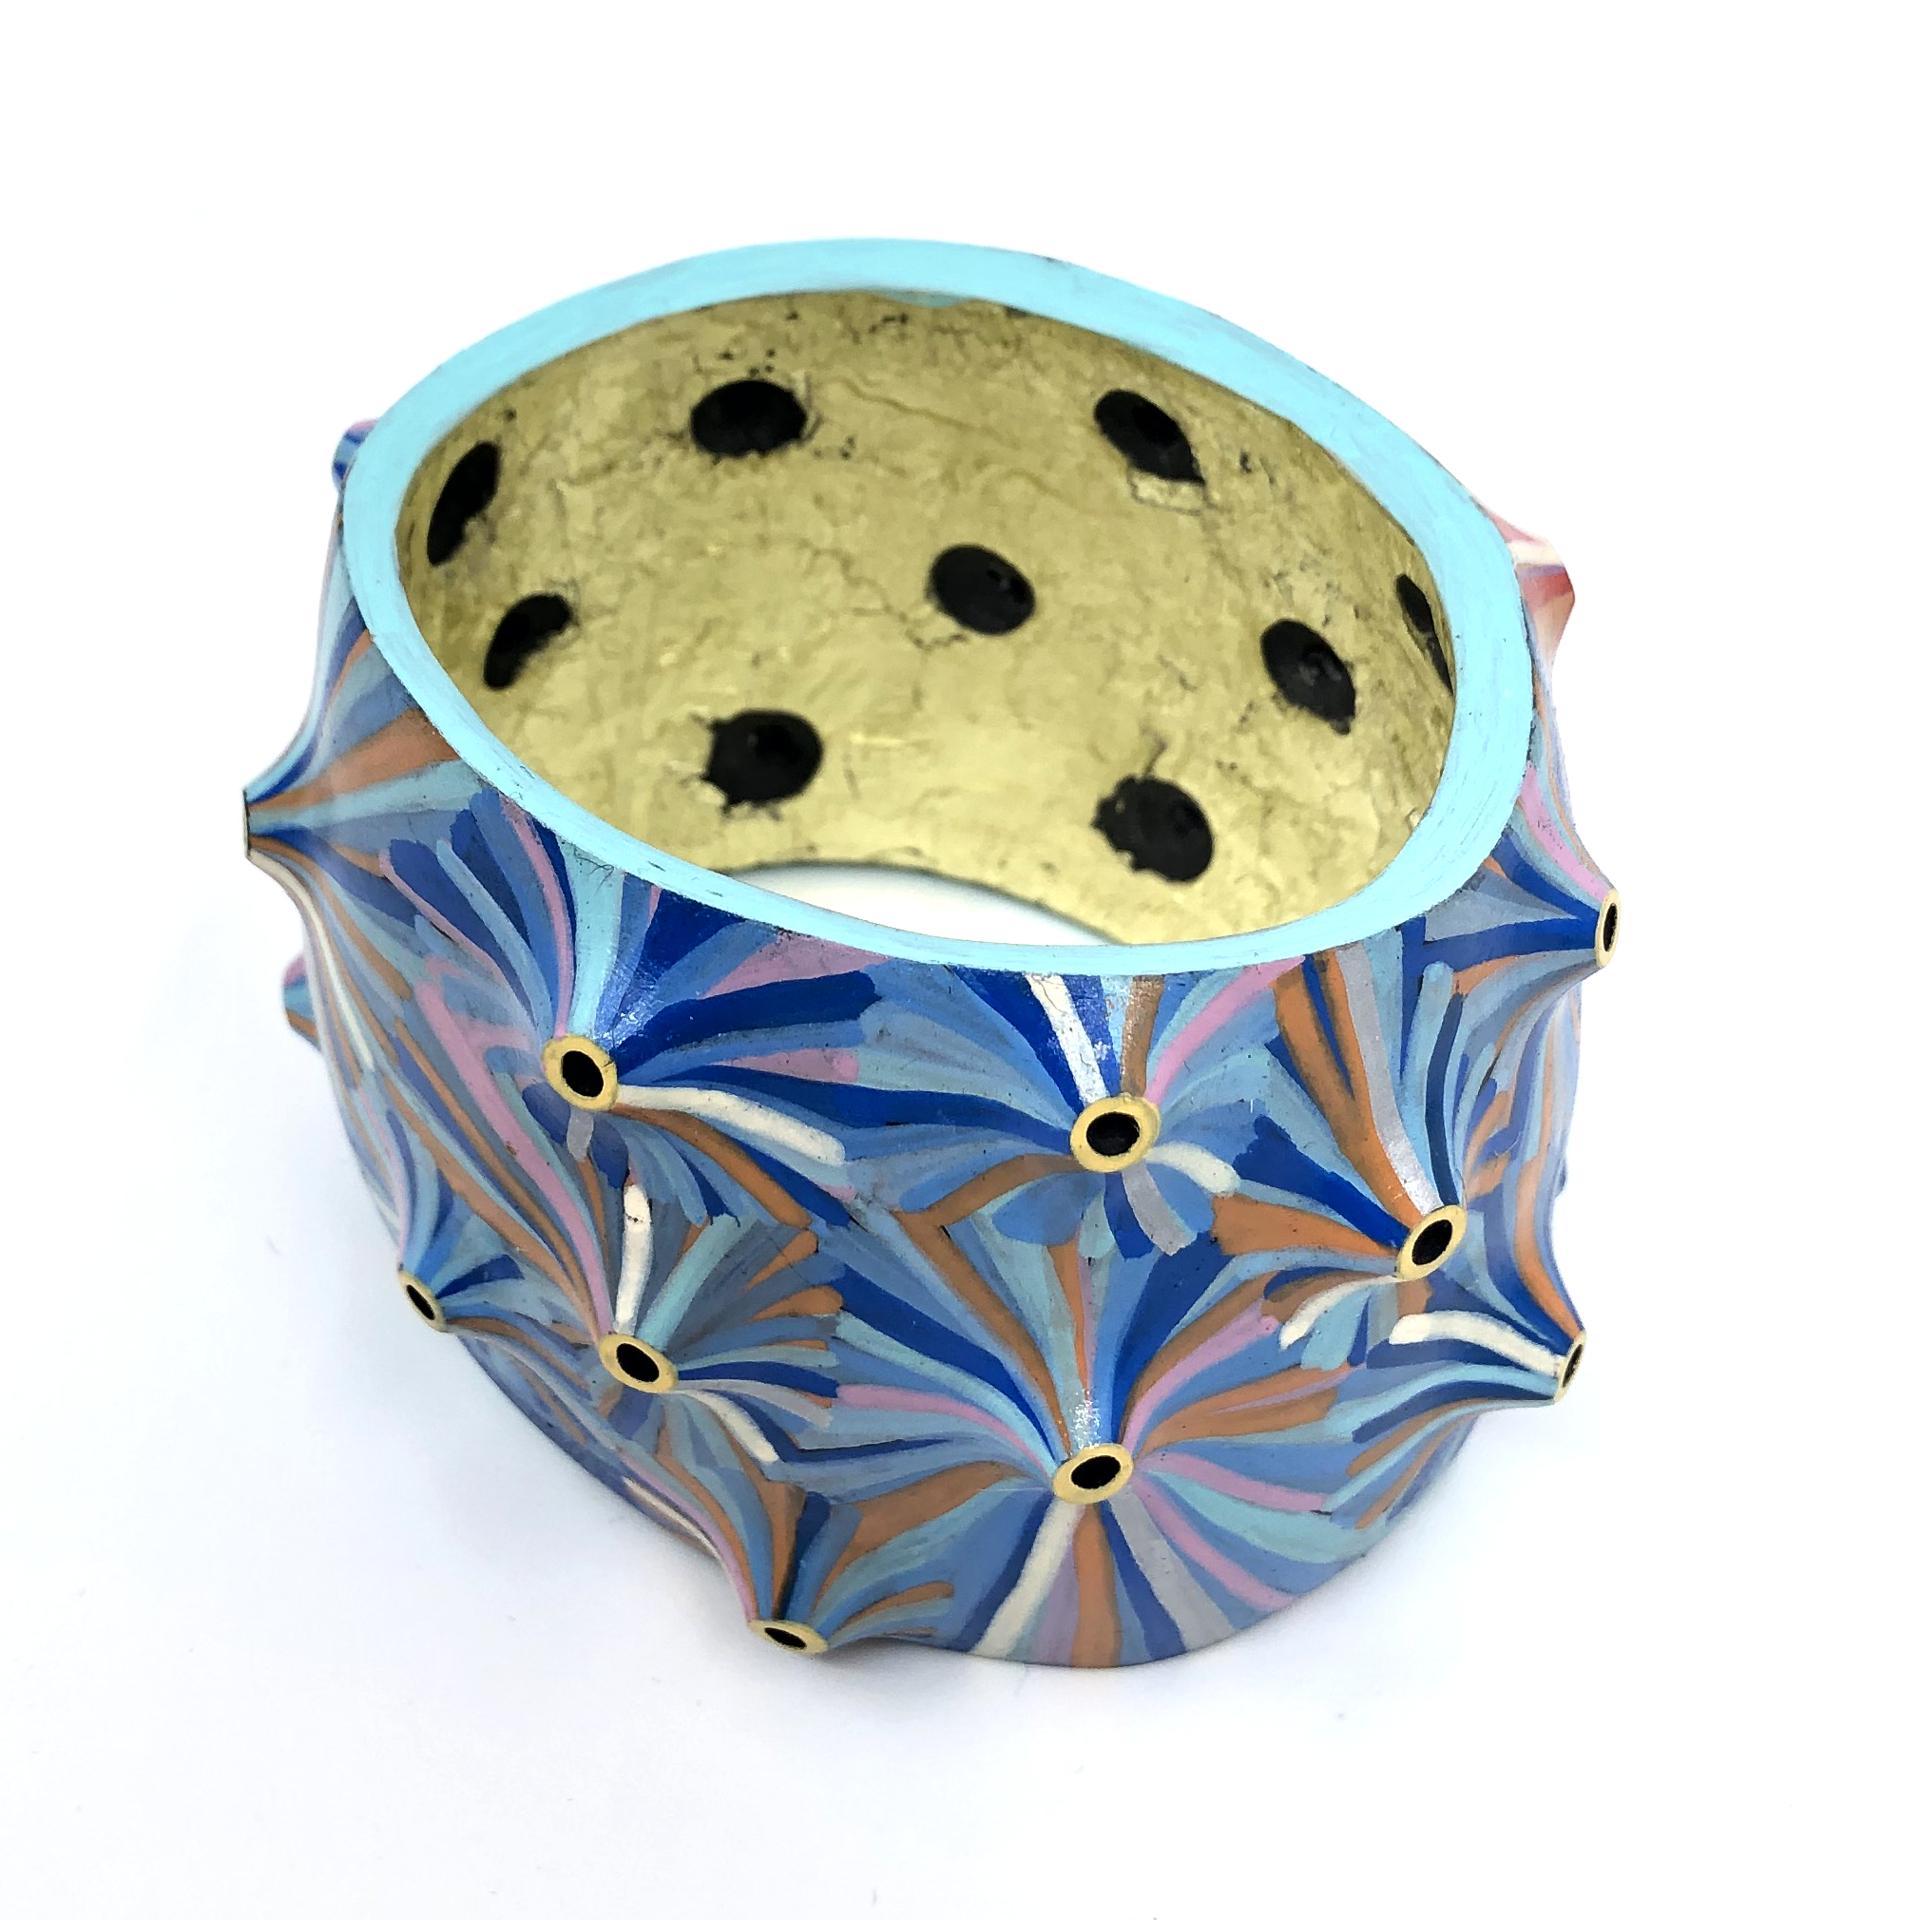 Untitled Bracelet Cuff by Lindsay Locatelli